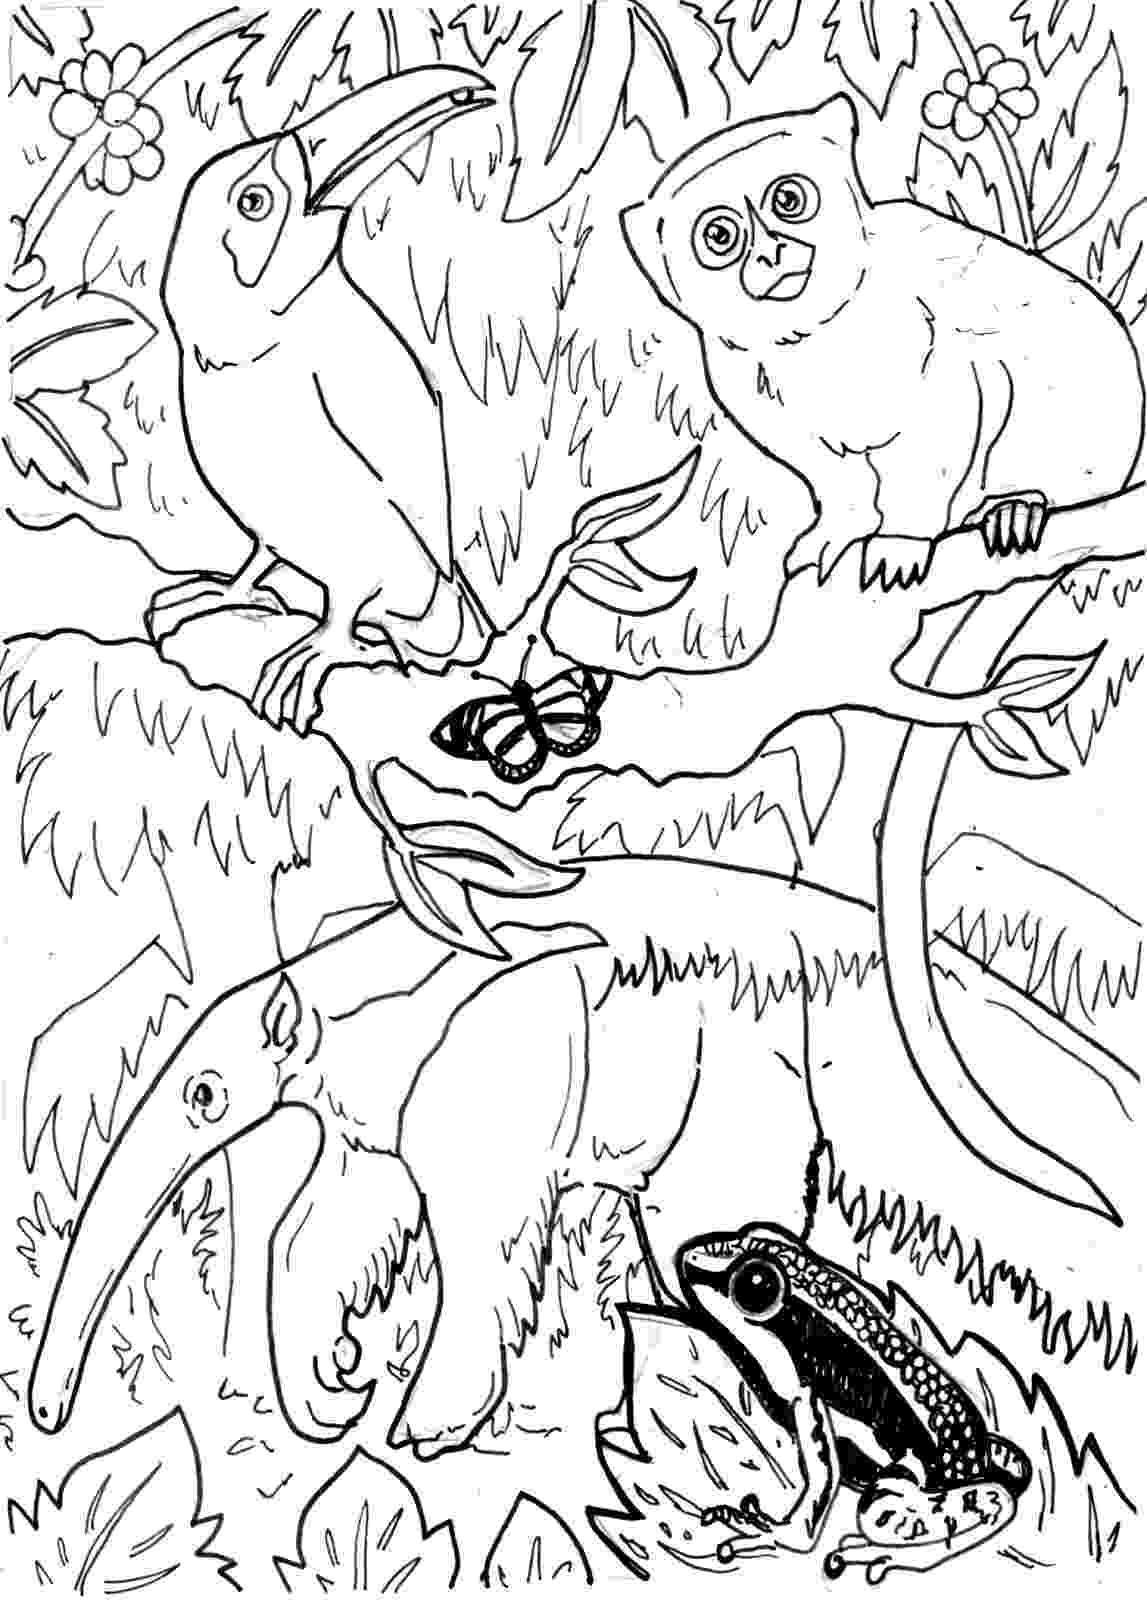 rainforest coloring pages tropical rainforest coloring pages coloring pages for kids pages rainforest coloring